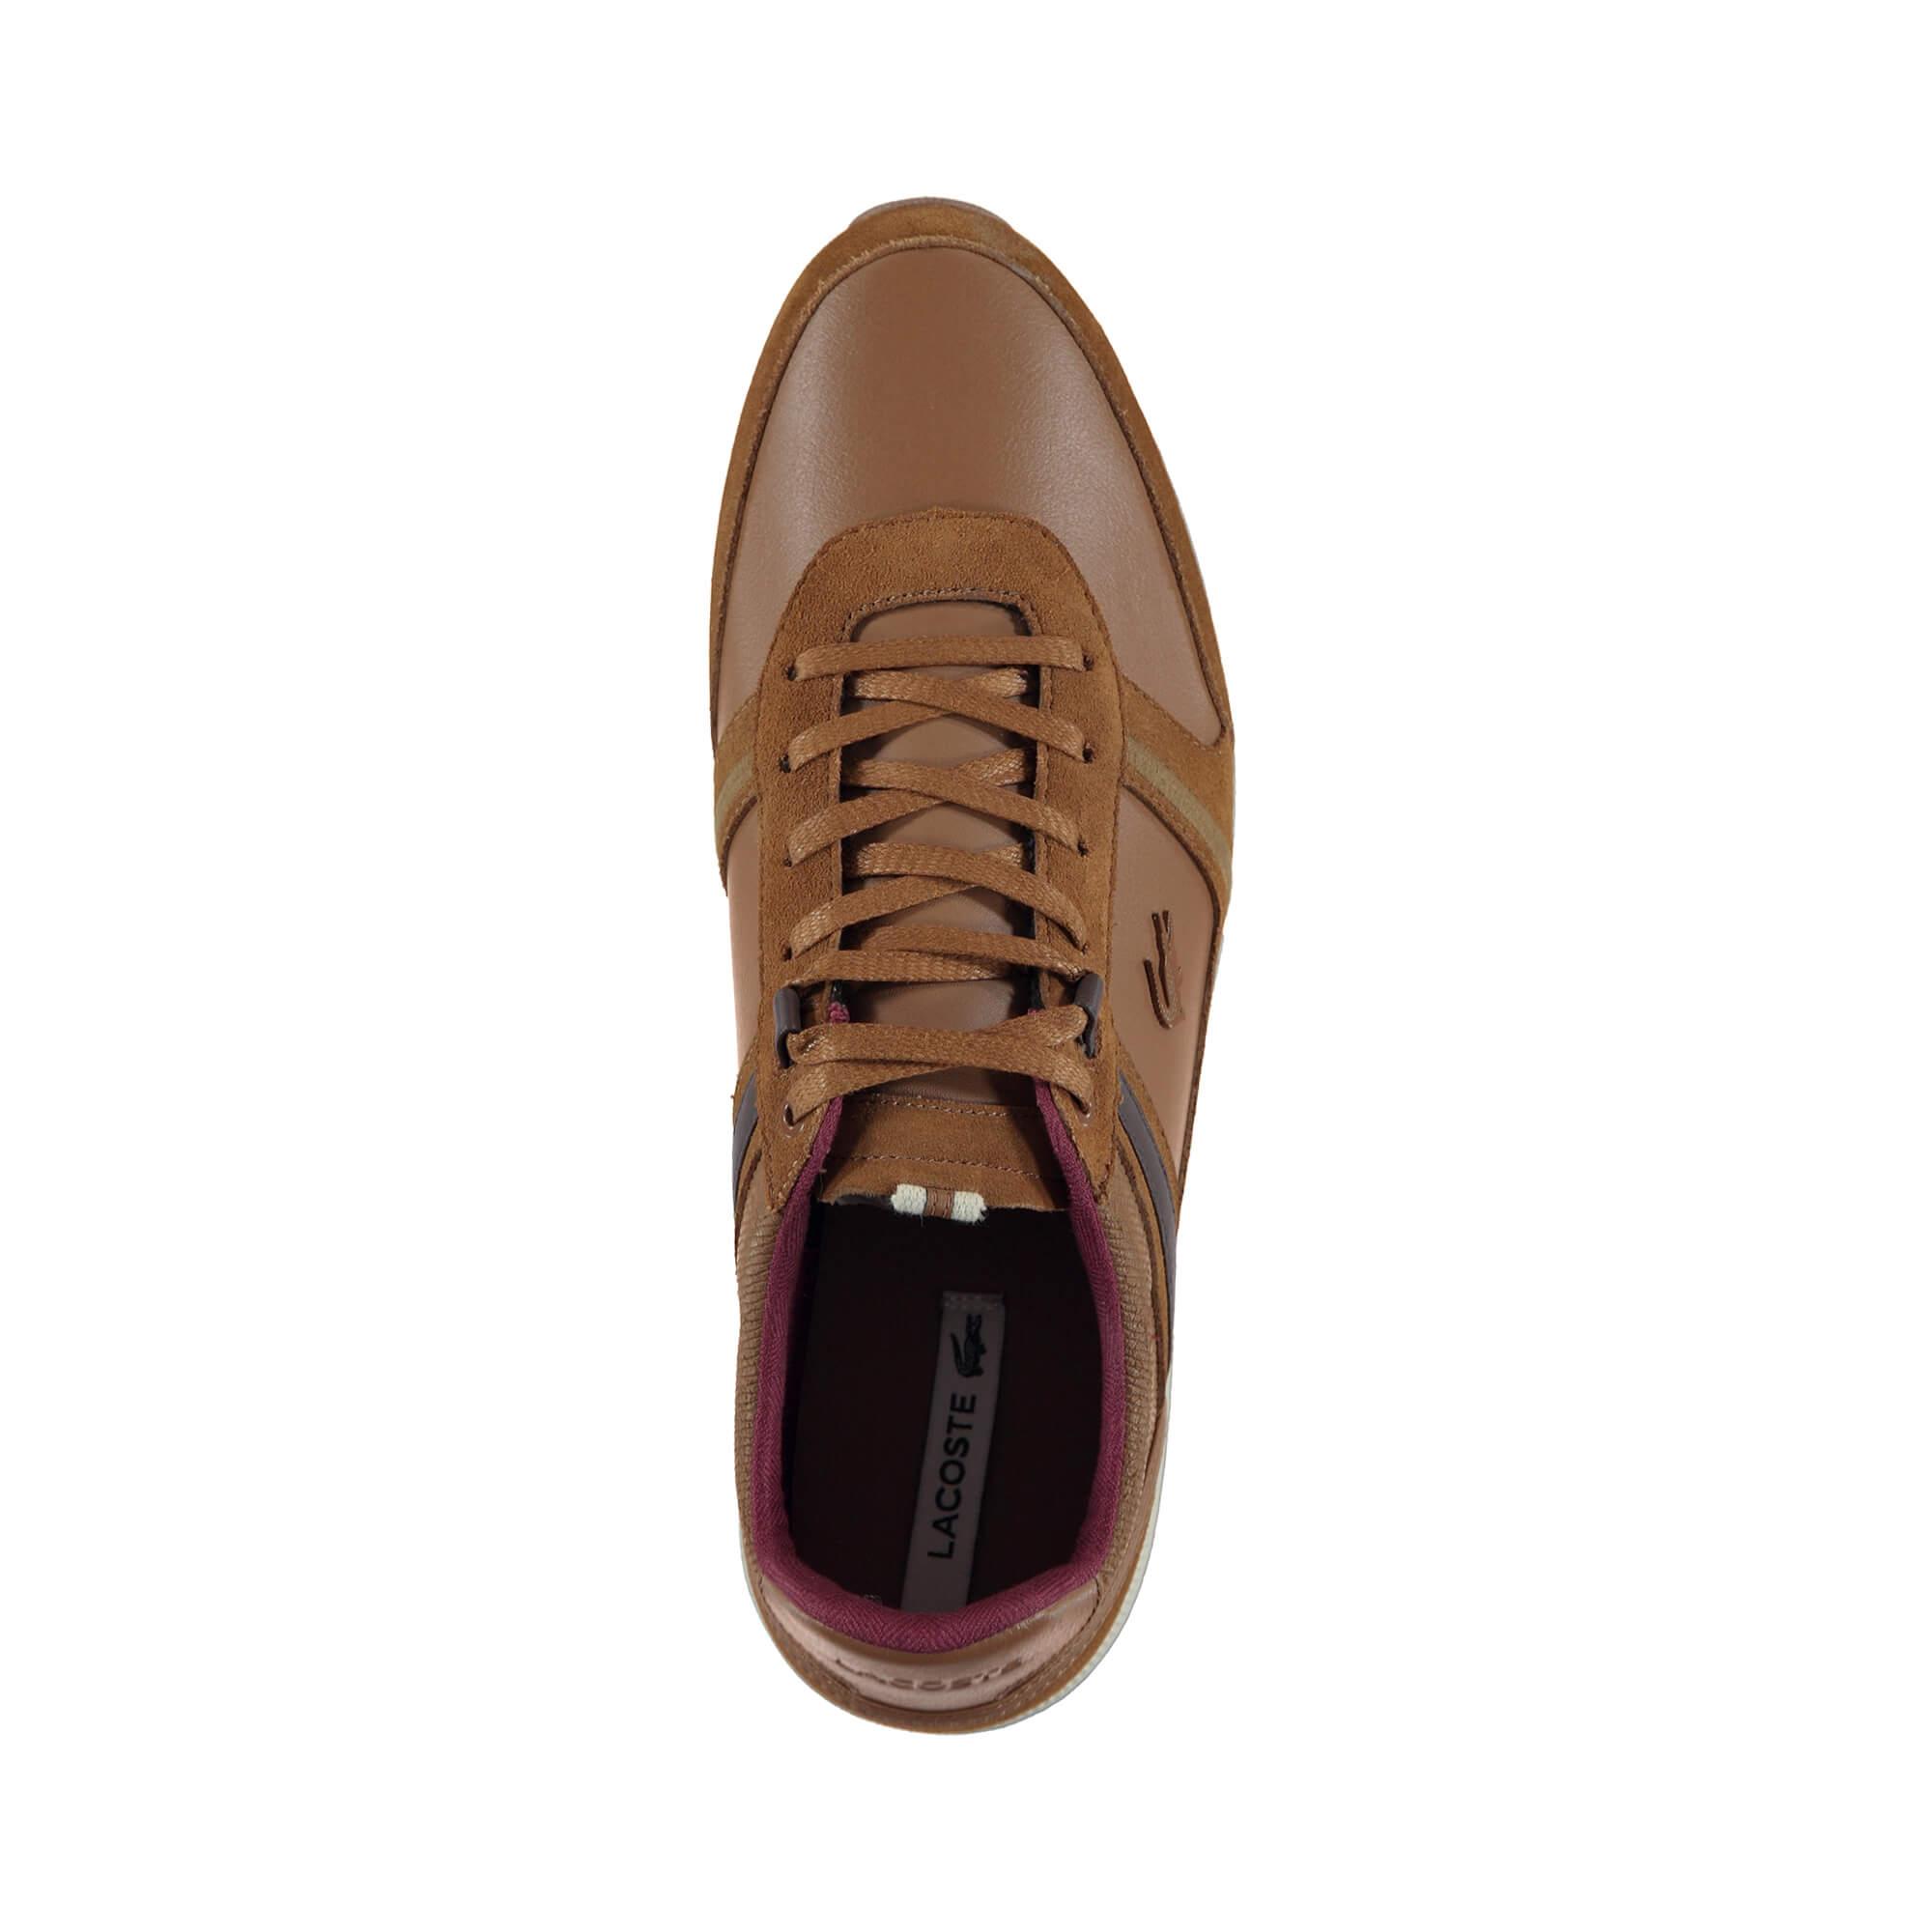 Lacoste Men's Menerva 318 1 Casual Shoes